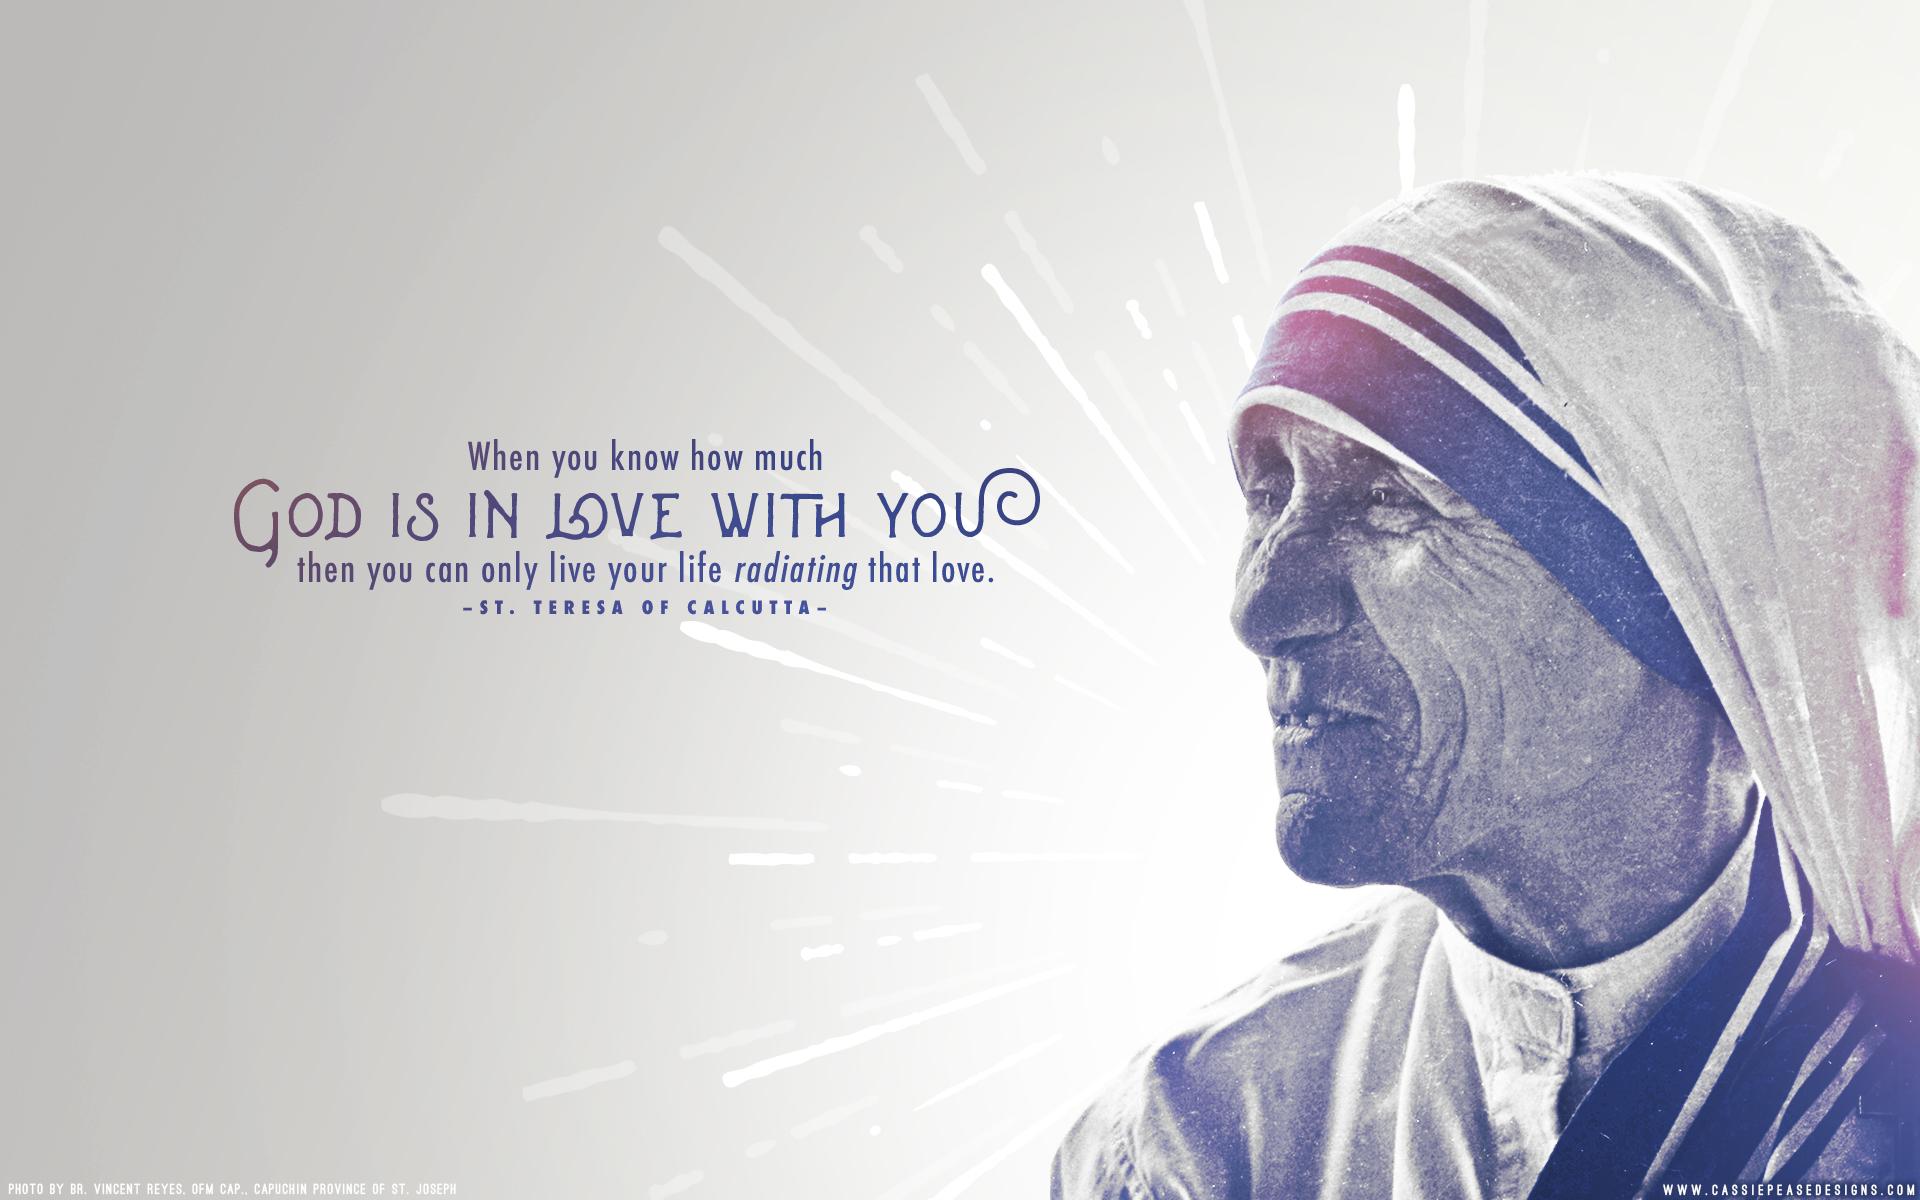 Mother Teresa Radiating Love Desktop Wallpaper Cassie Pease Designs